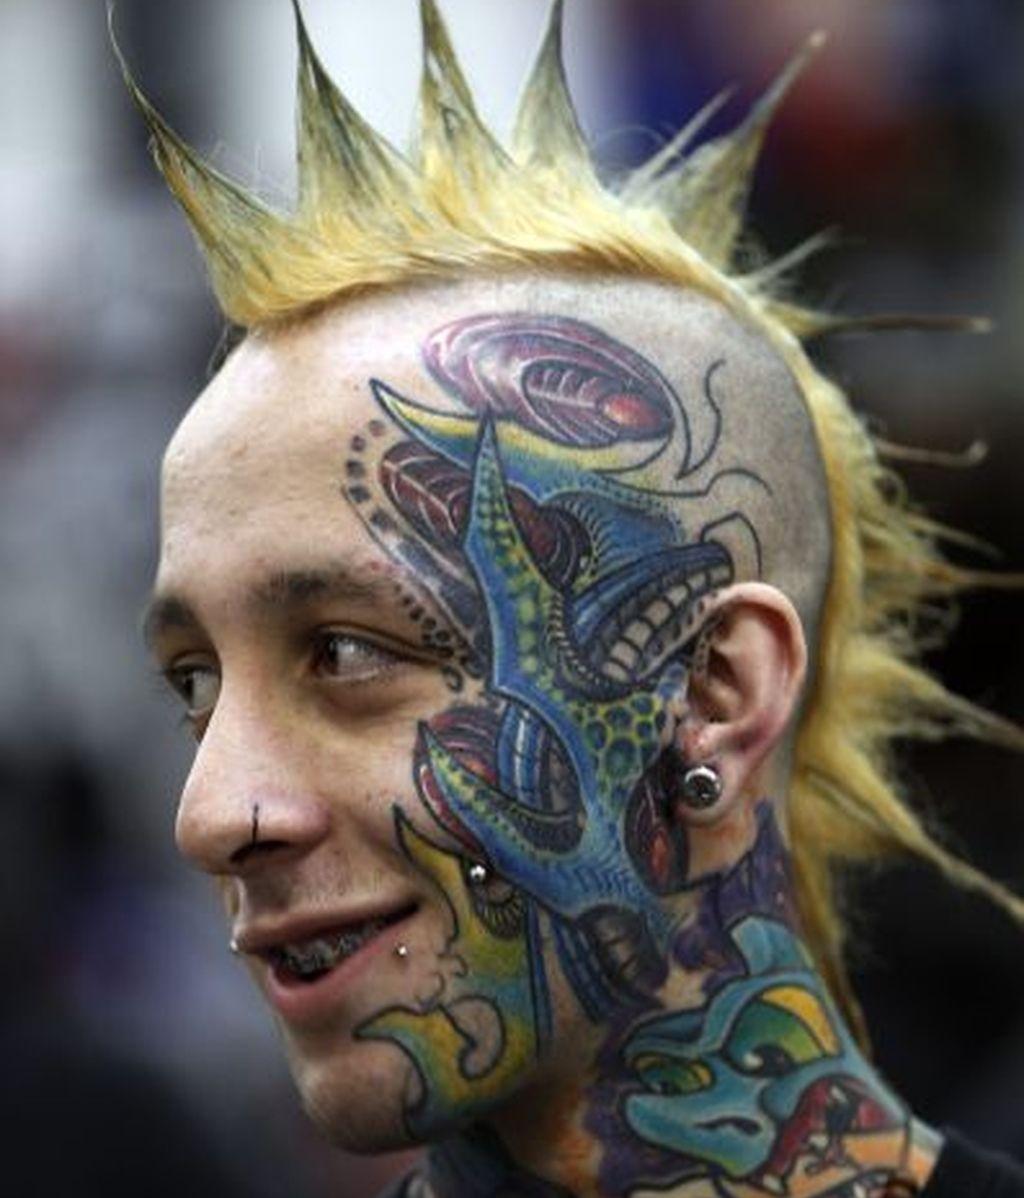 Tatuajes y crestas